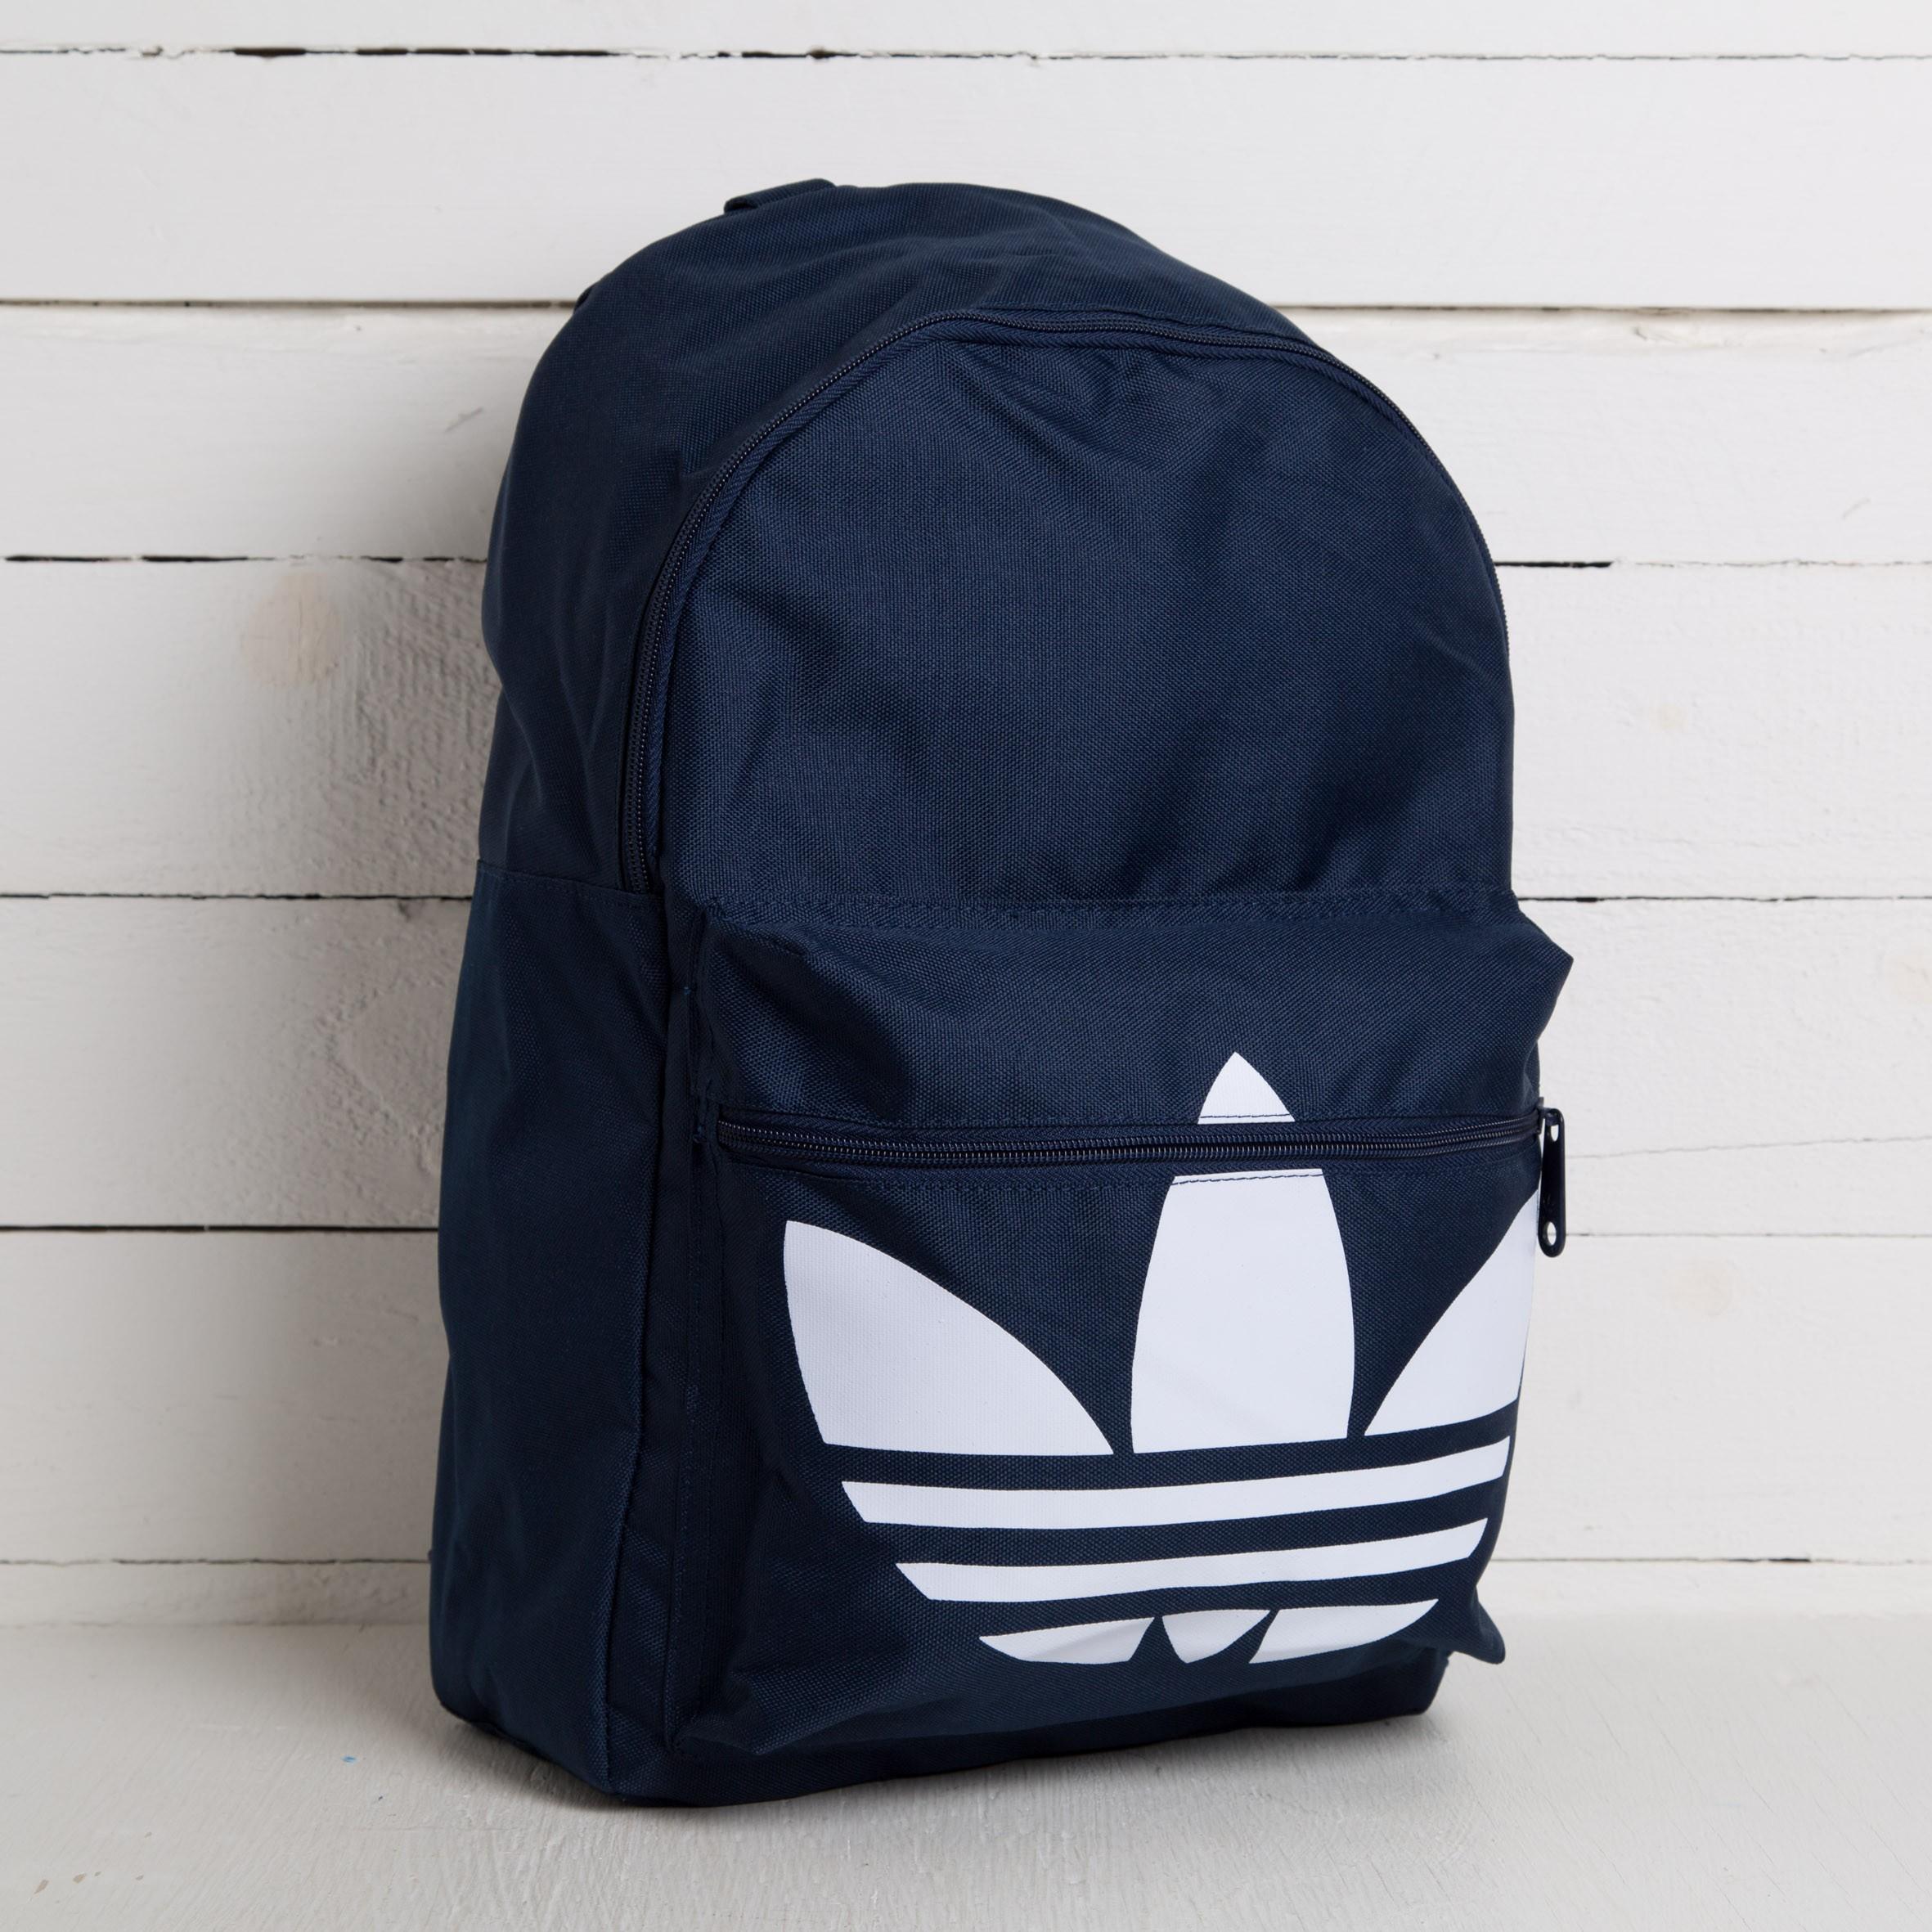 adidas Backpack Classic Trefoil Night Indigo  White  bcb7a5f316286